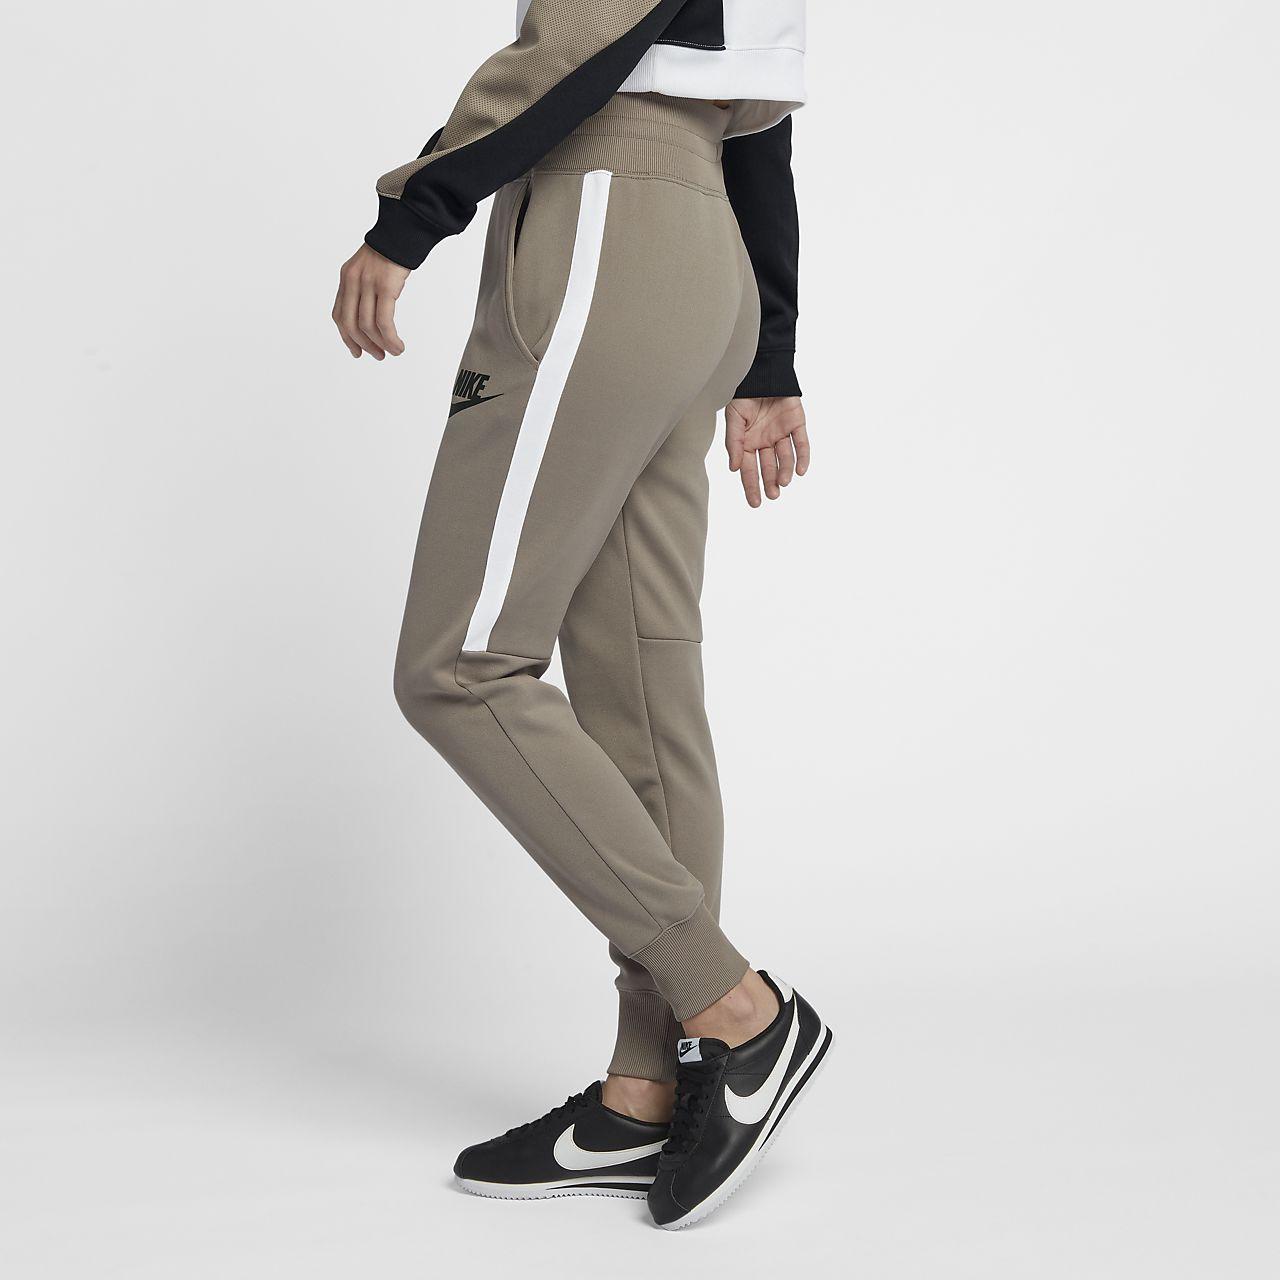 Low Resolution Jogging Nike Sportswear pour Femme Jogging Nike Sportswear  pour Femme